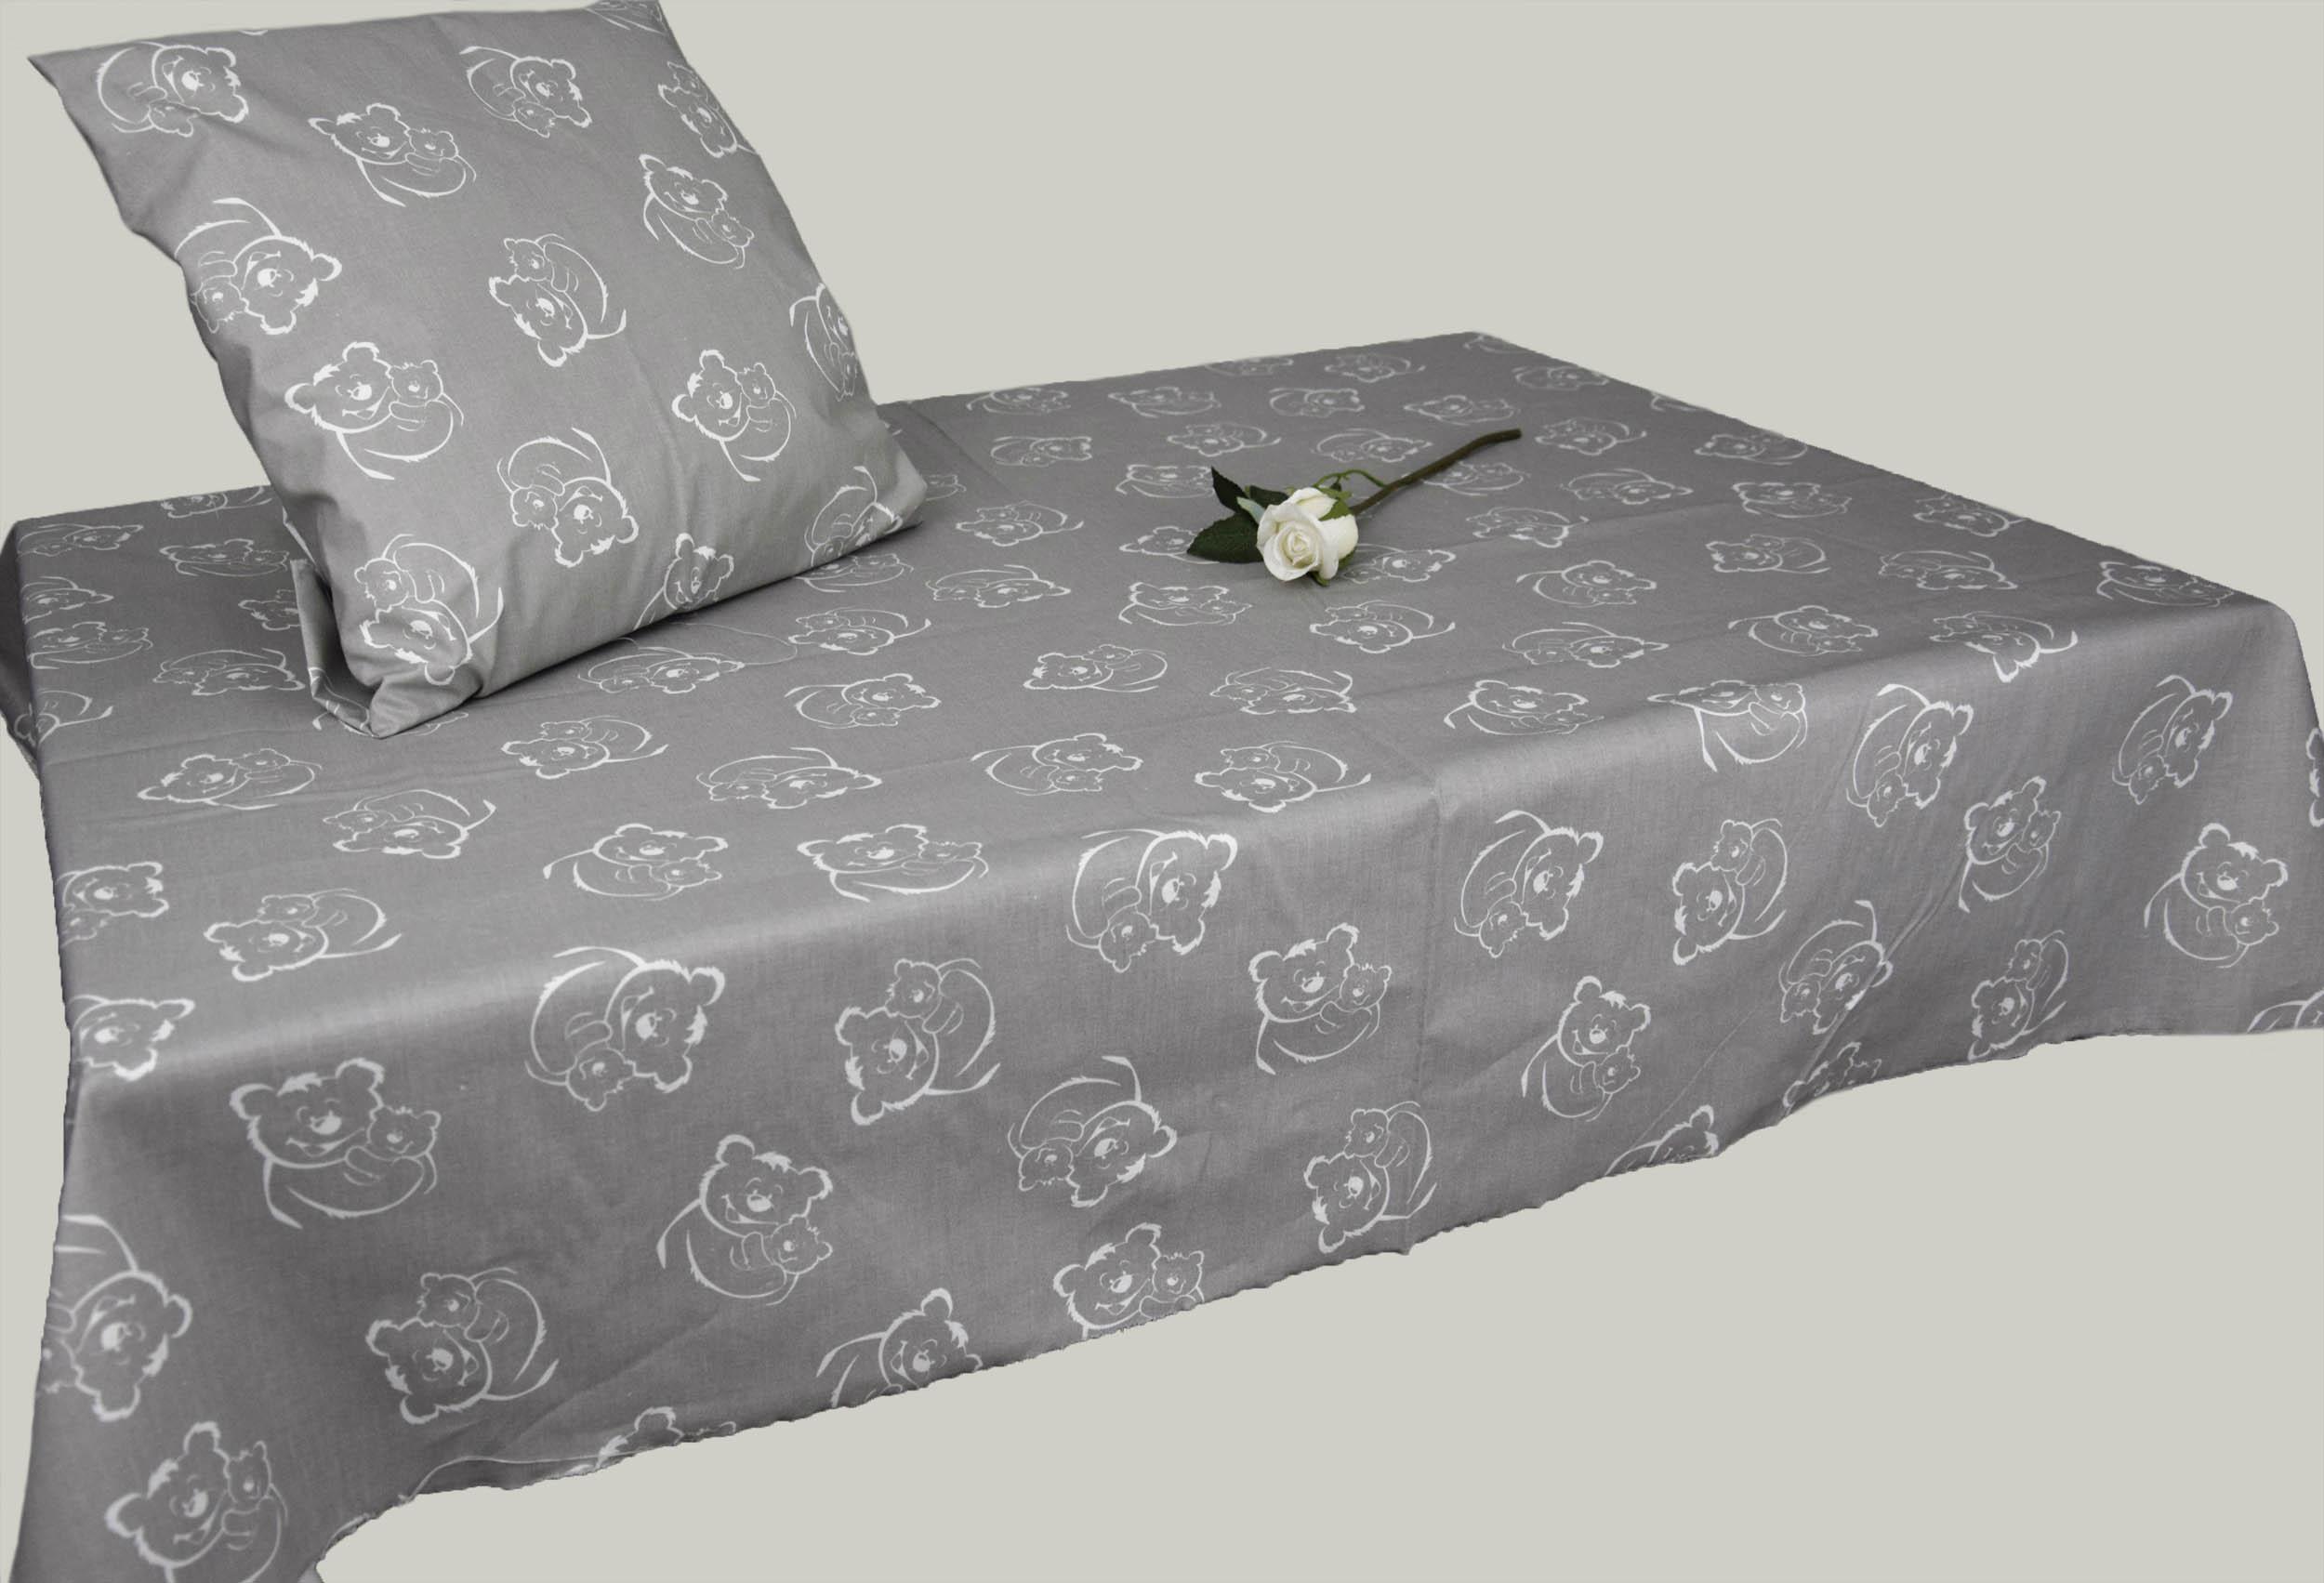 stoffe baumwolle deko dekostoff teddyb r teddy aschgrau. Black Bedroom Furniture Sets. Home Design Ideas